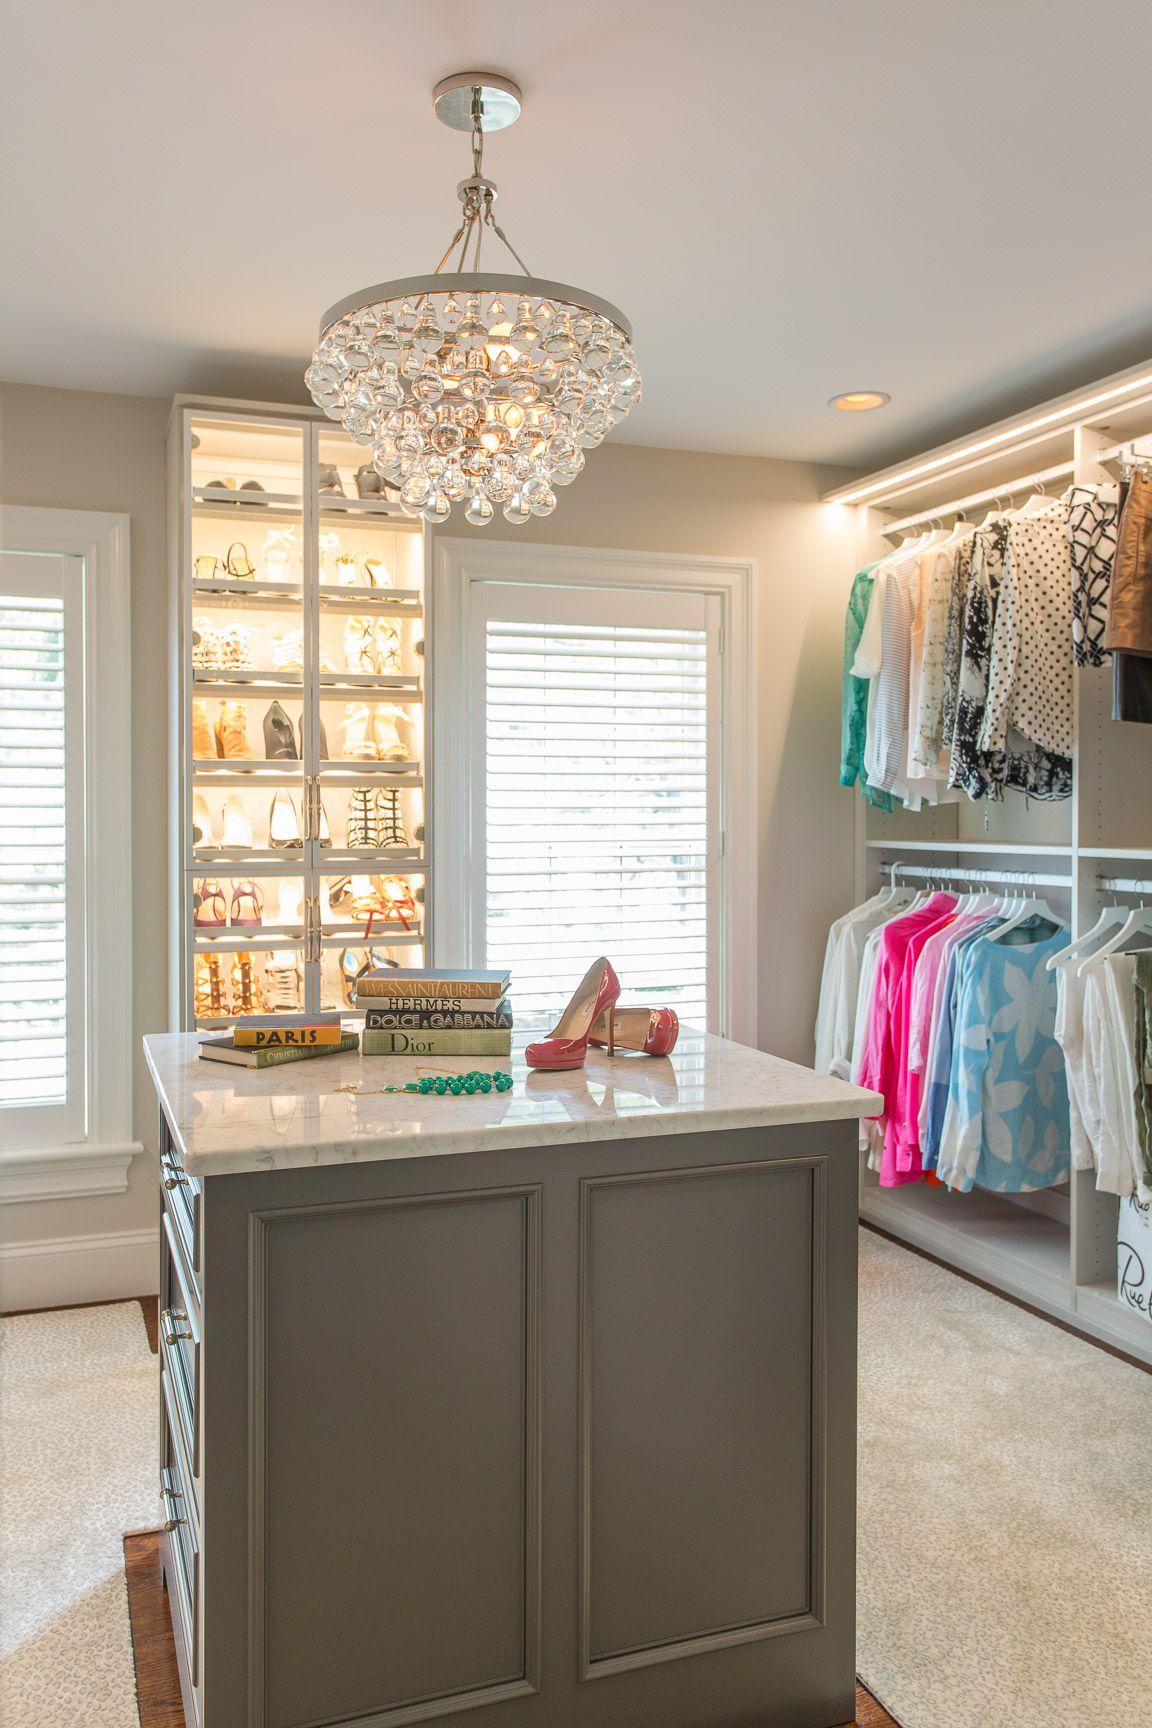 20 great walk in closet ideas